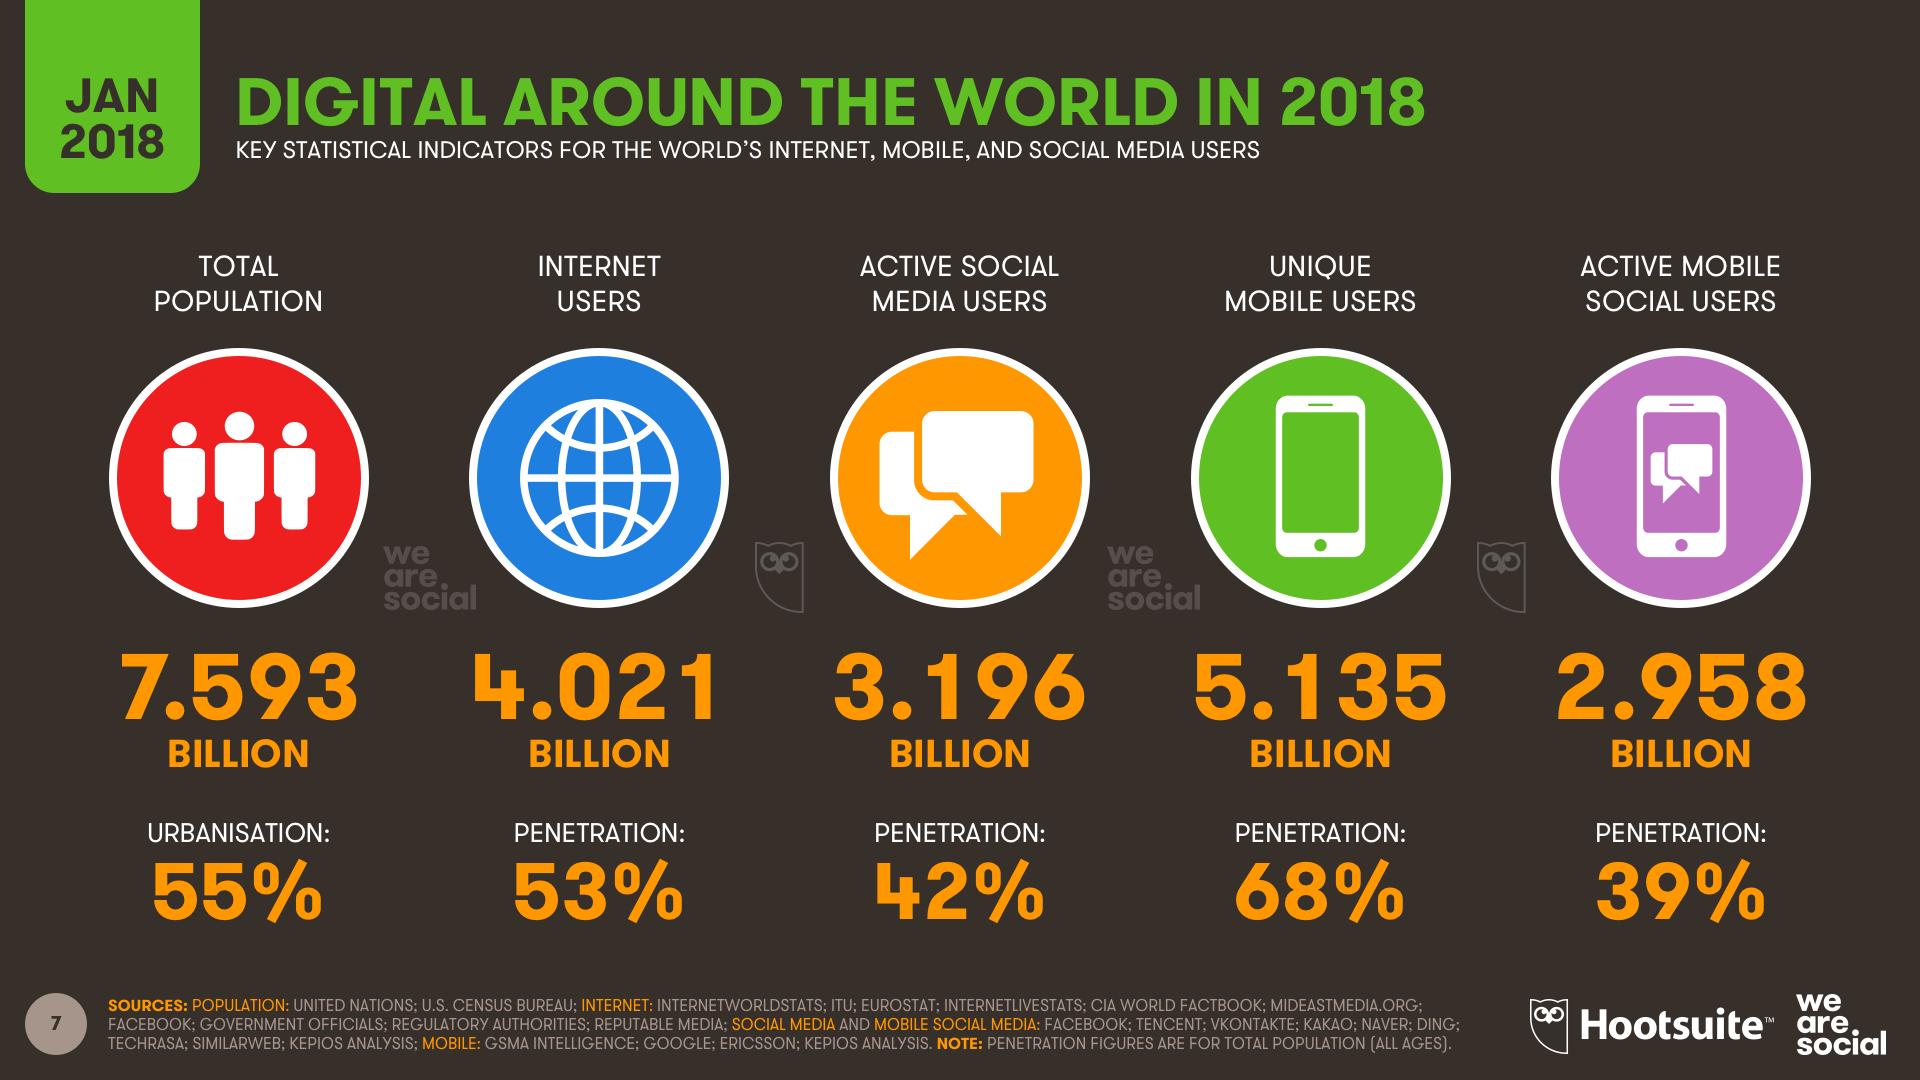 Hootsuite Digital Around the World